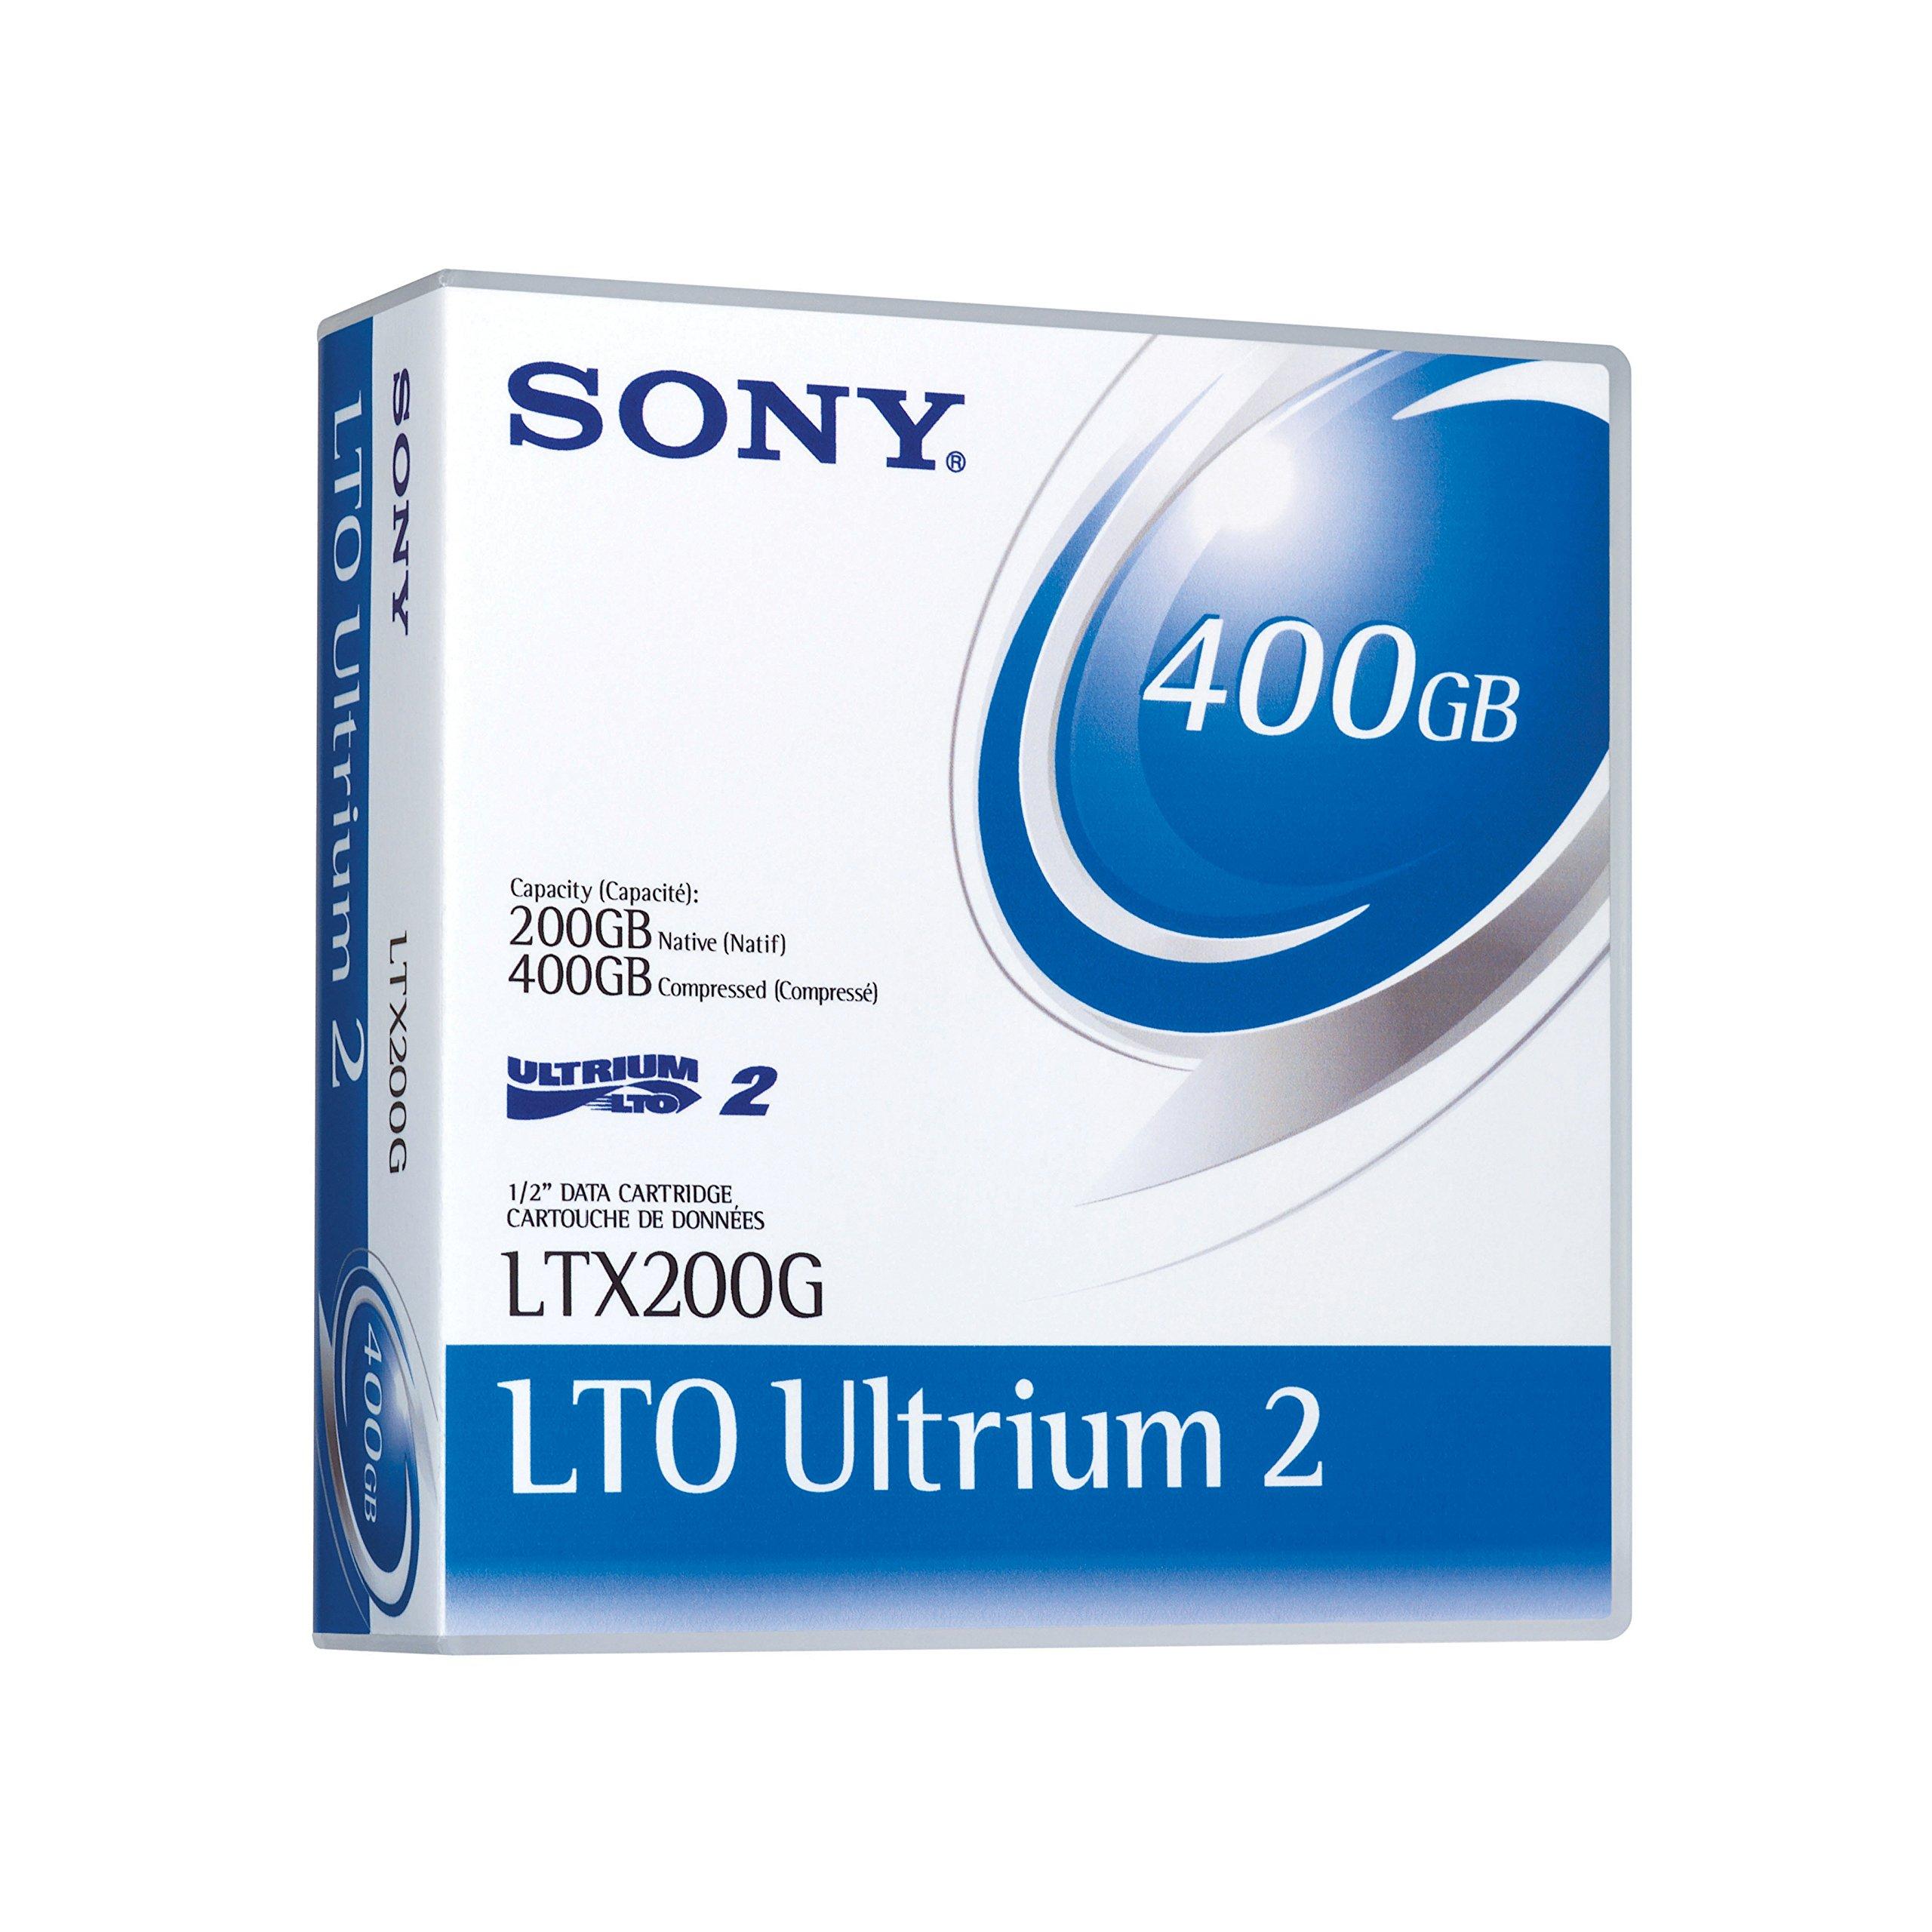 Sony LTO Ultrium 2 Tape Cartridge